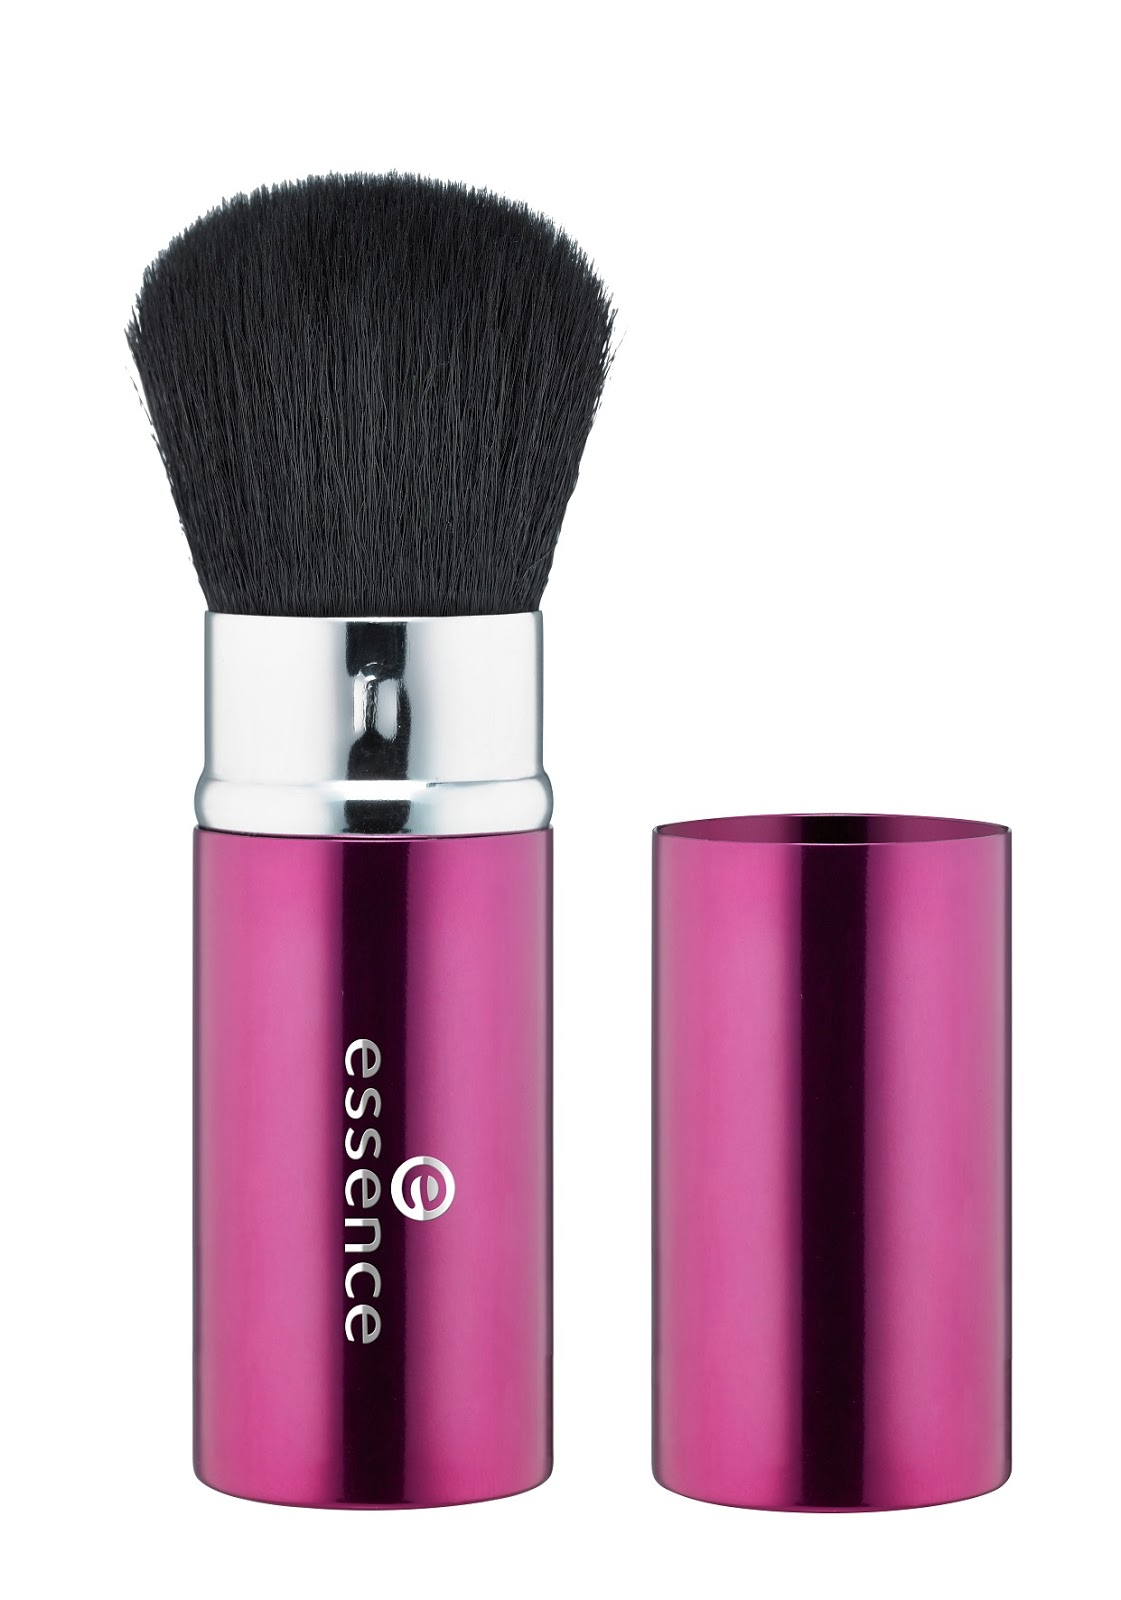 essence aquatix – mini powder brush